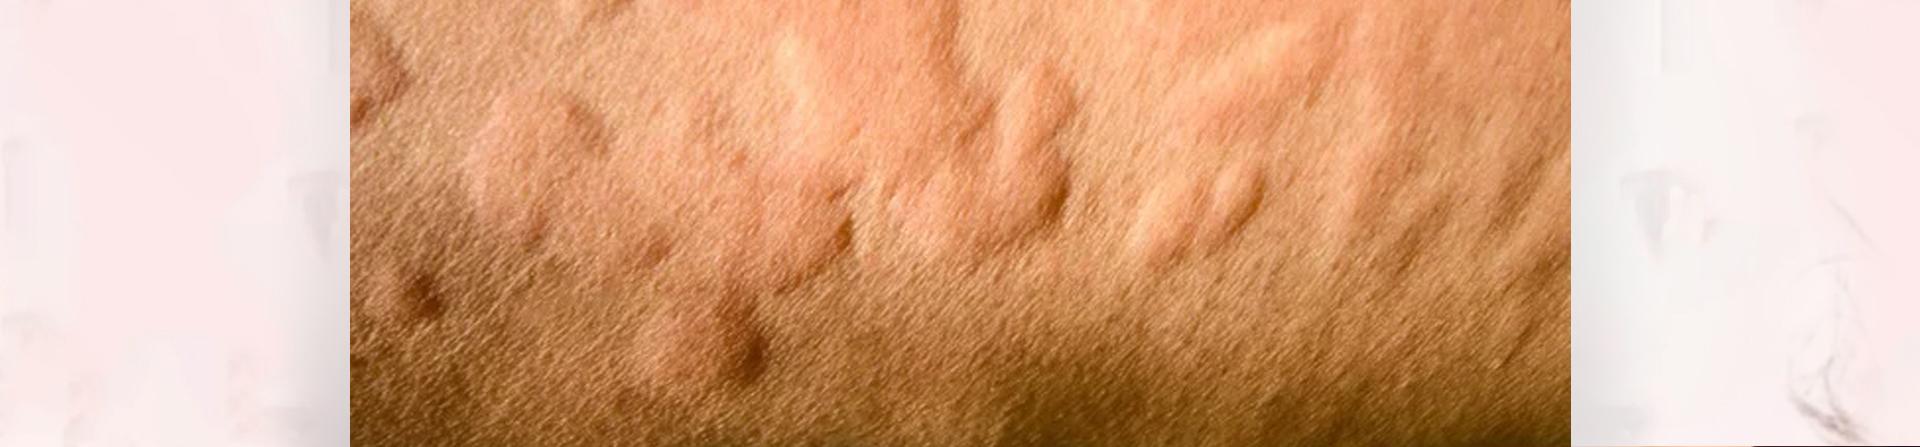 Ashu Skin Care| Best Skin Allergy Treatment in Bhubaneswar Odisha